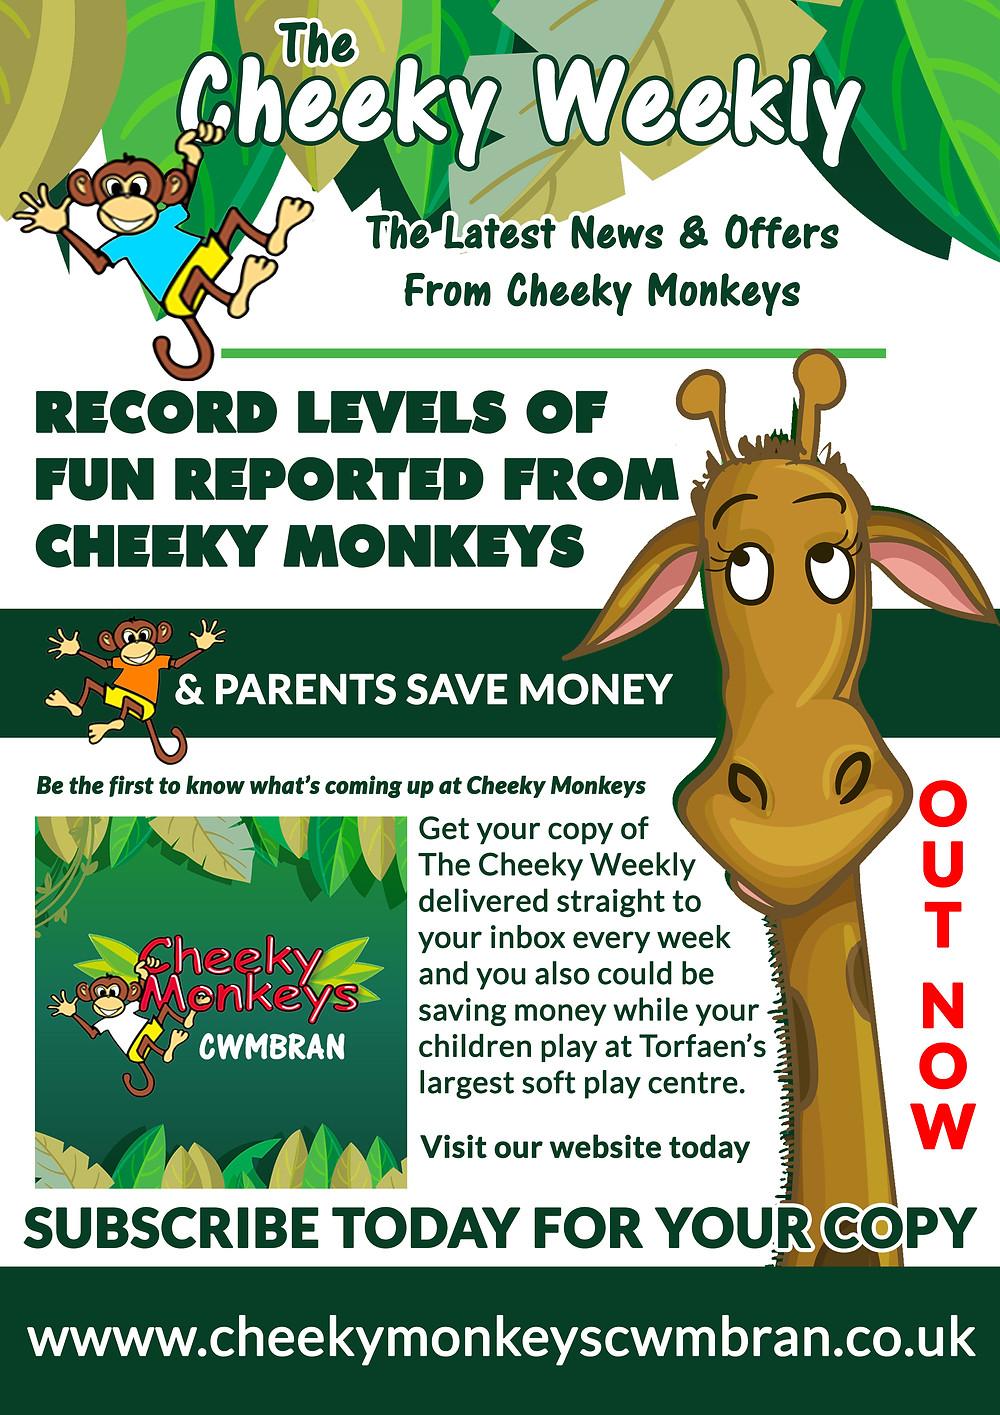 Cheeky Monkeys Cwmbran